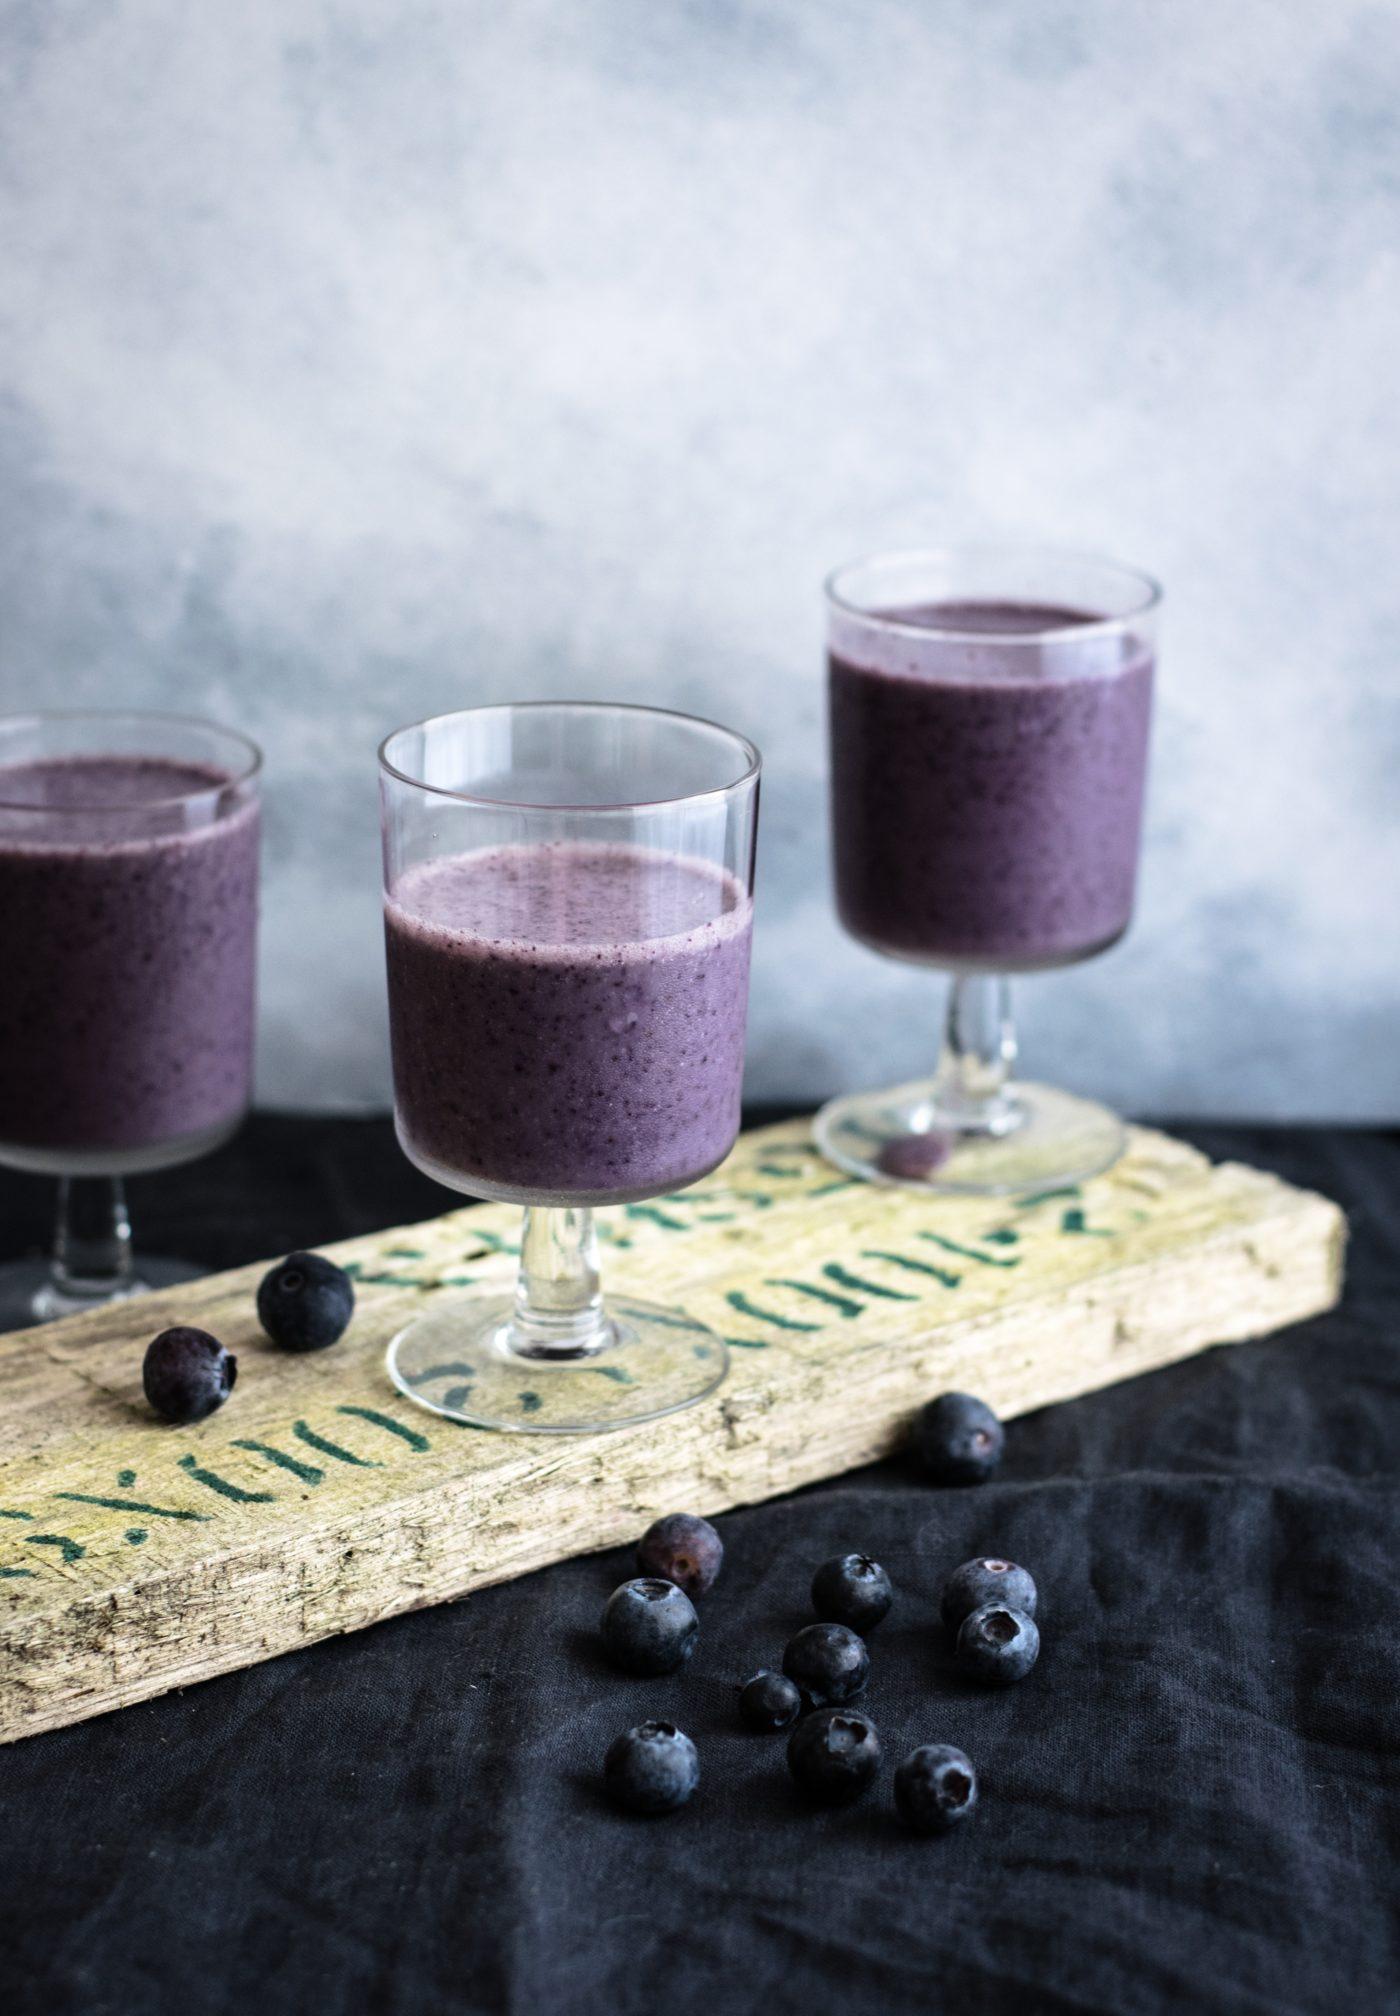 Recette healthy Uberti - Milkshake myrtille